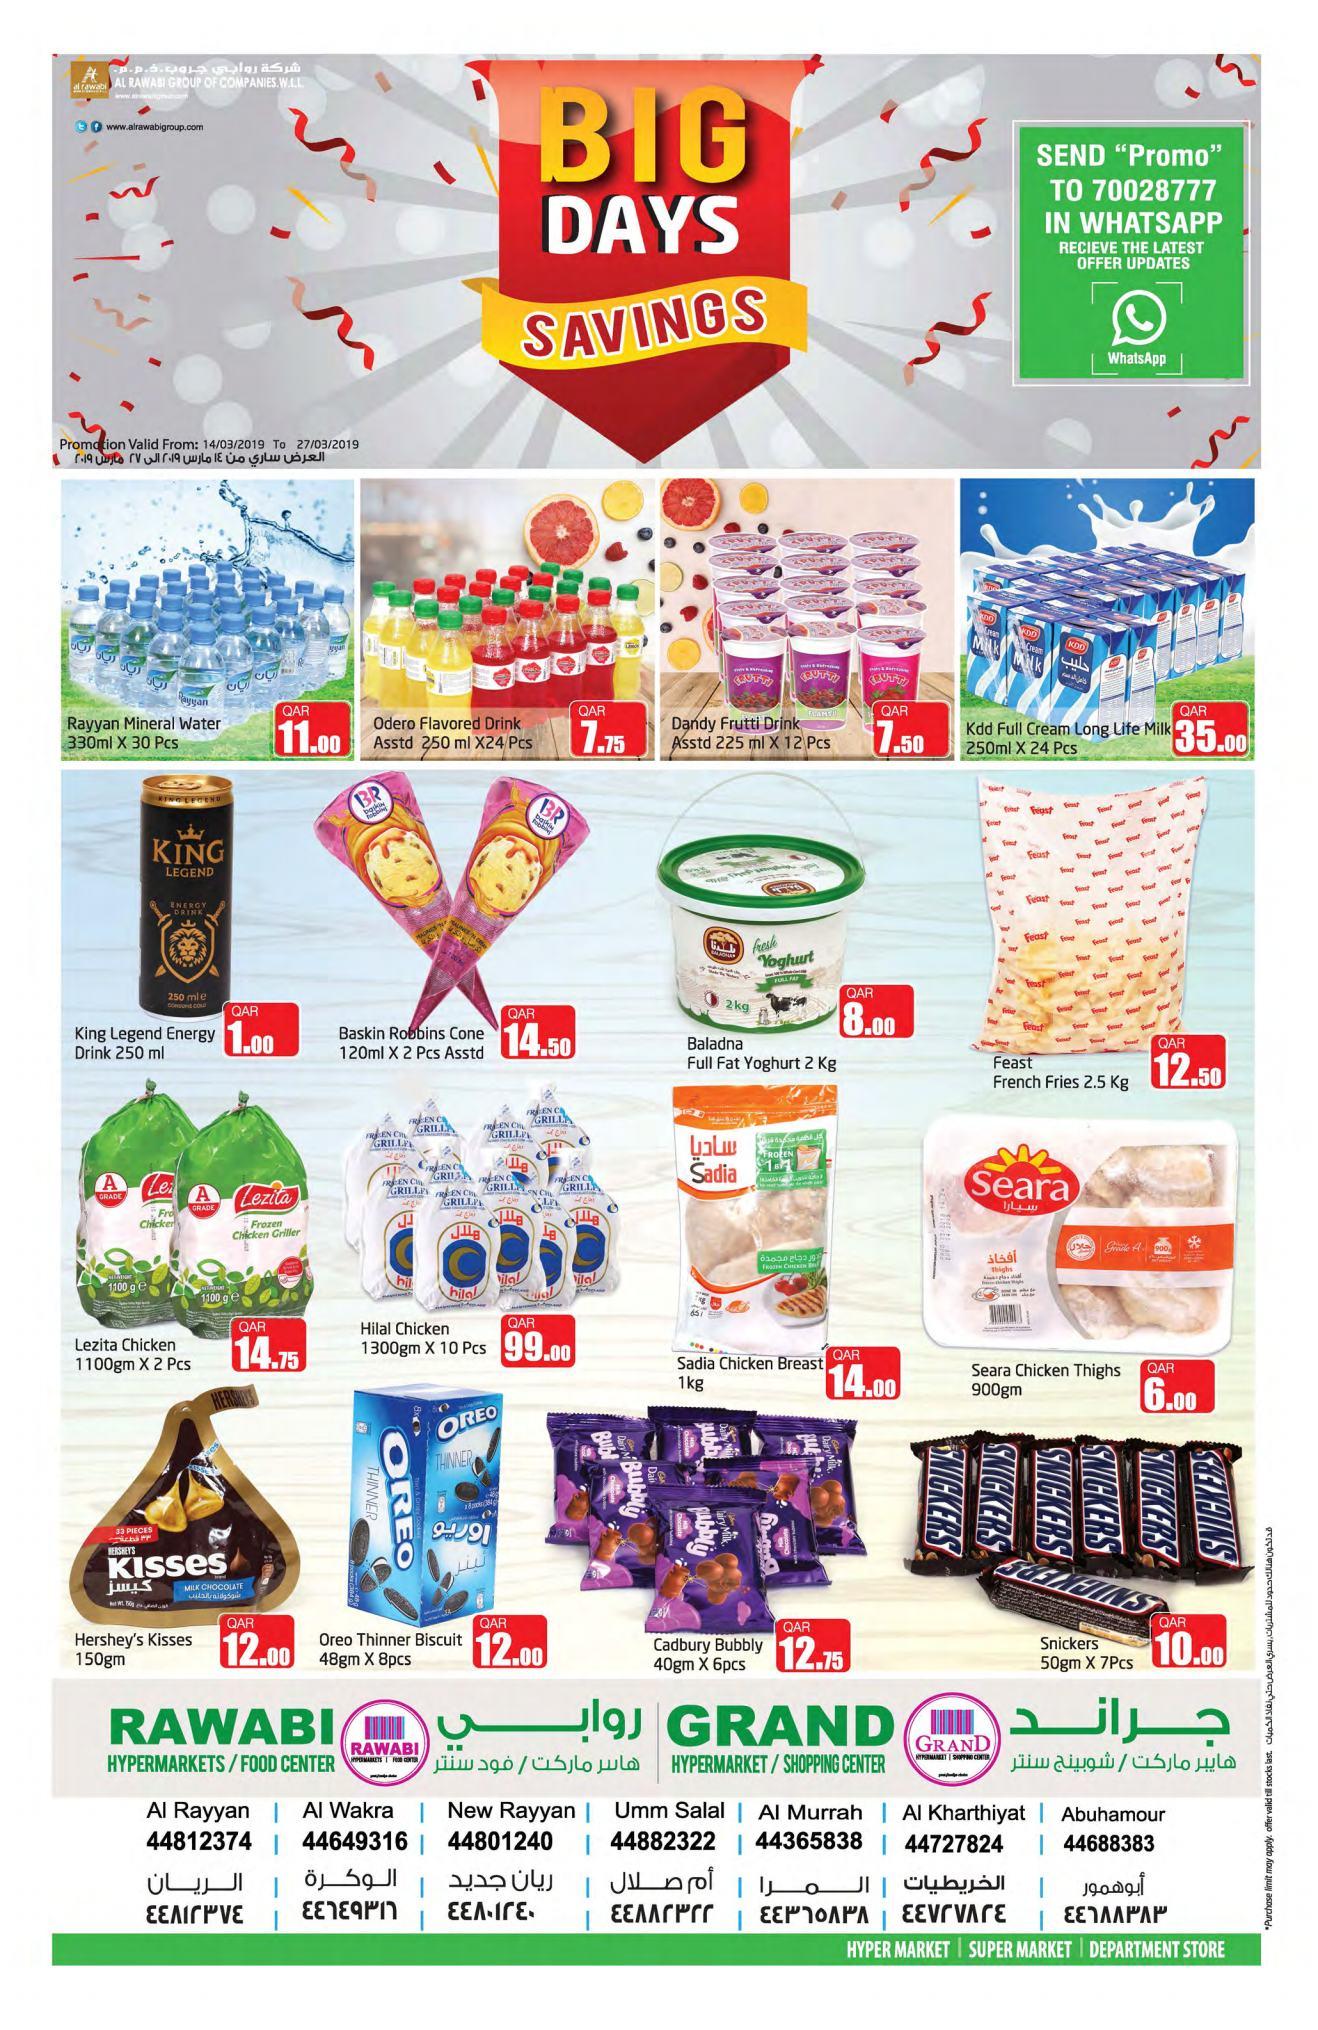 Al Rawabi Big Day Savings till 27/03